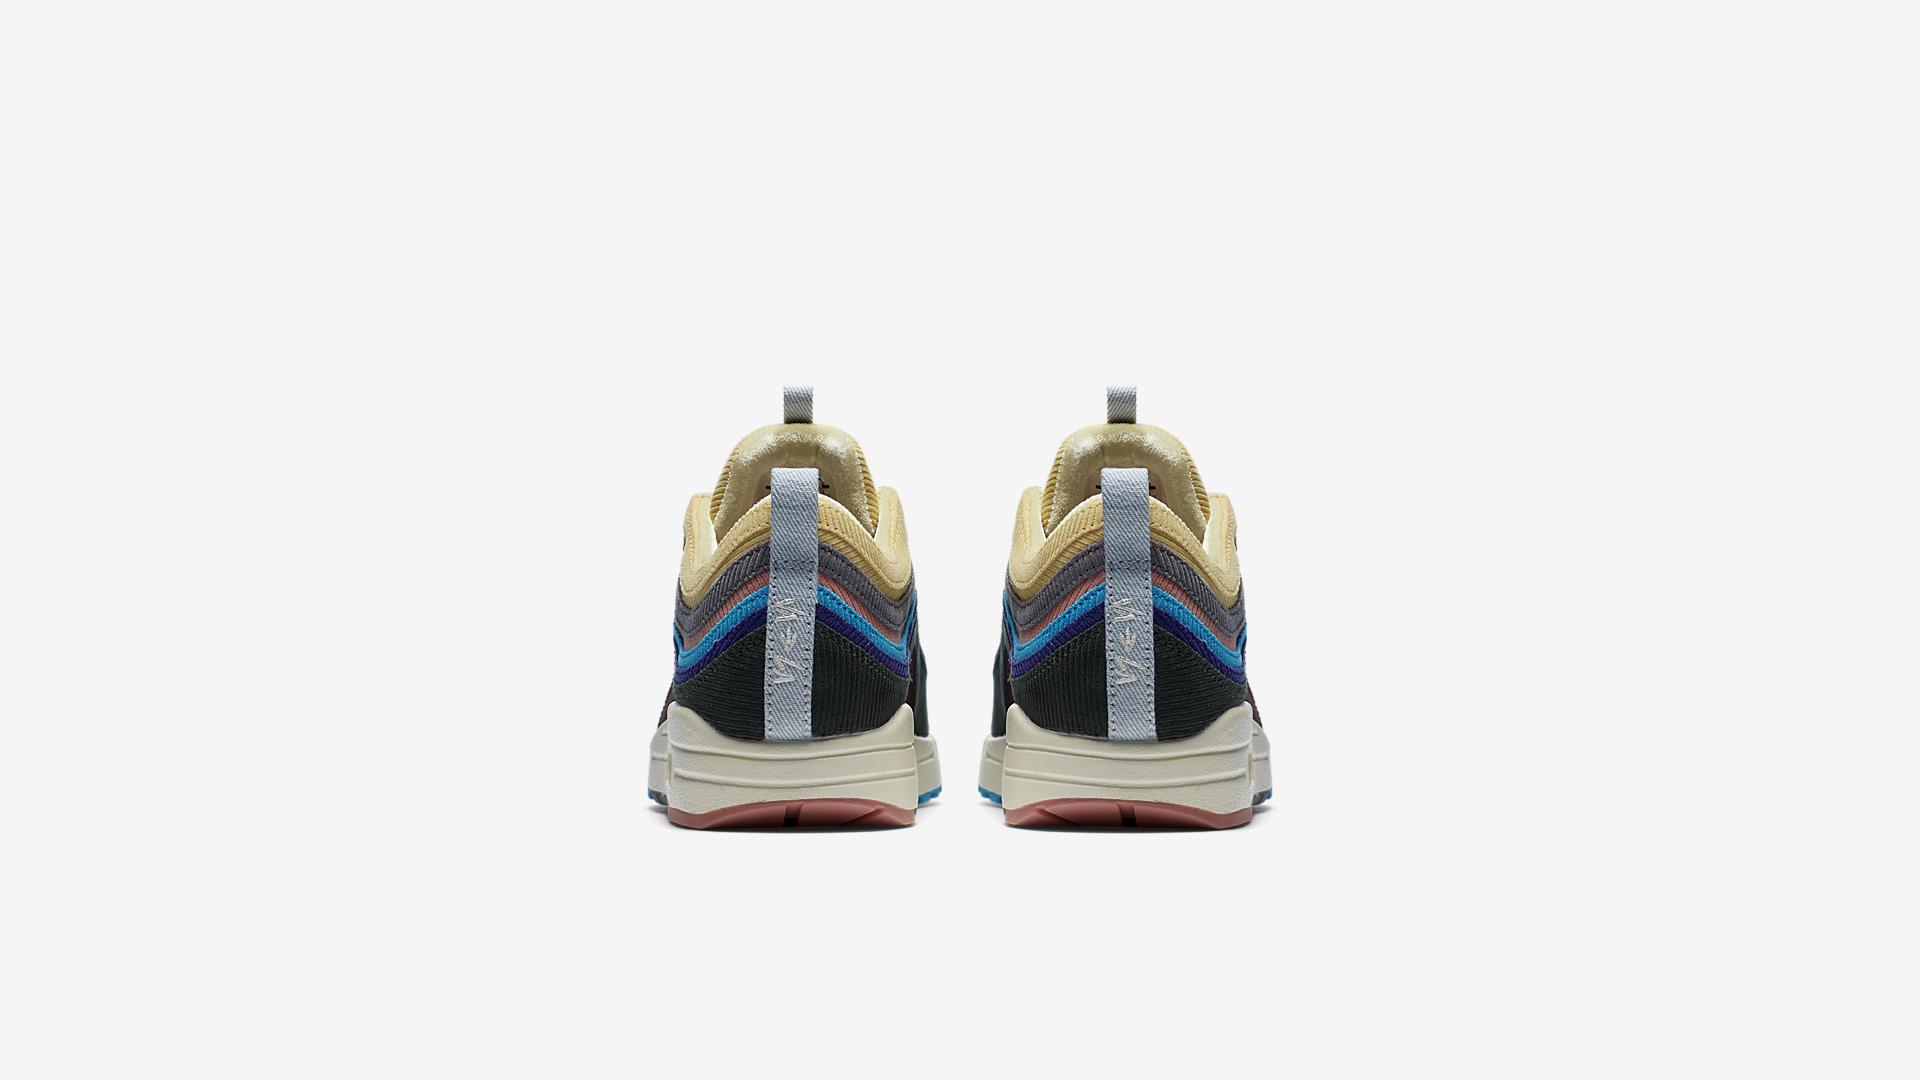 AJ4219 400 Nike Air Max 1 97 Sean Wotherspoon 1